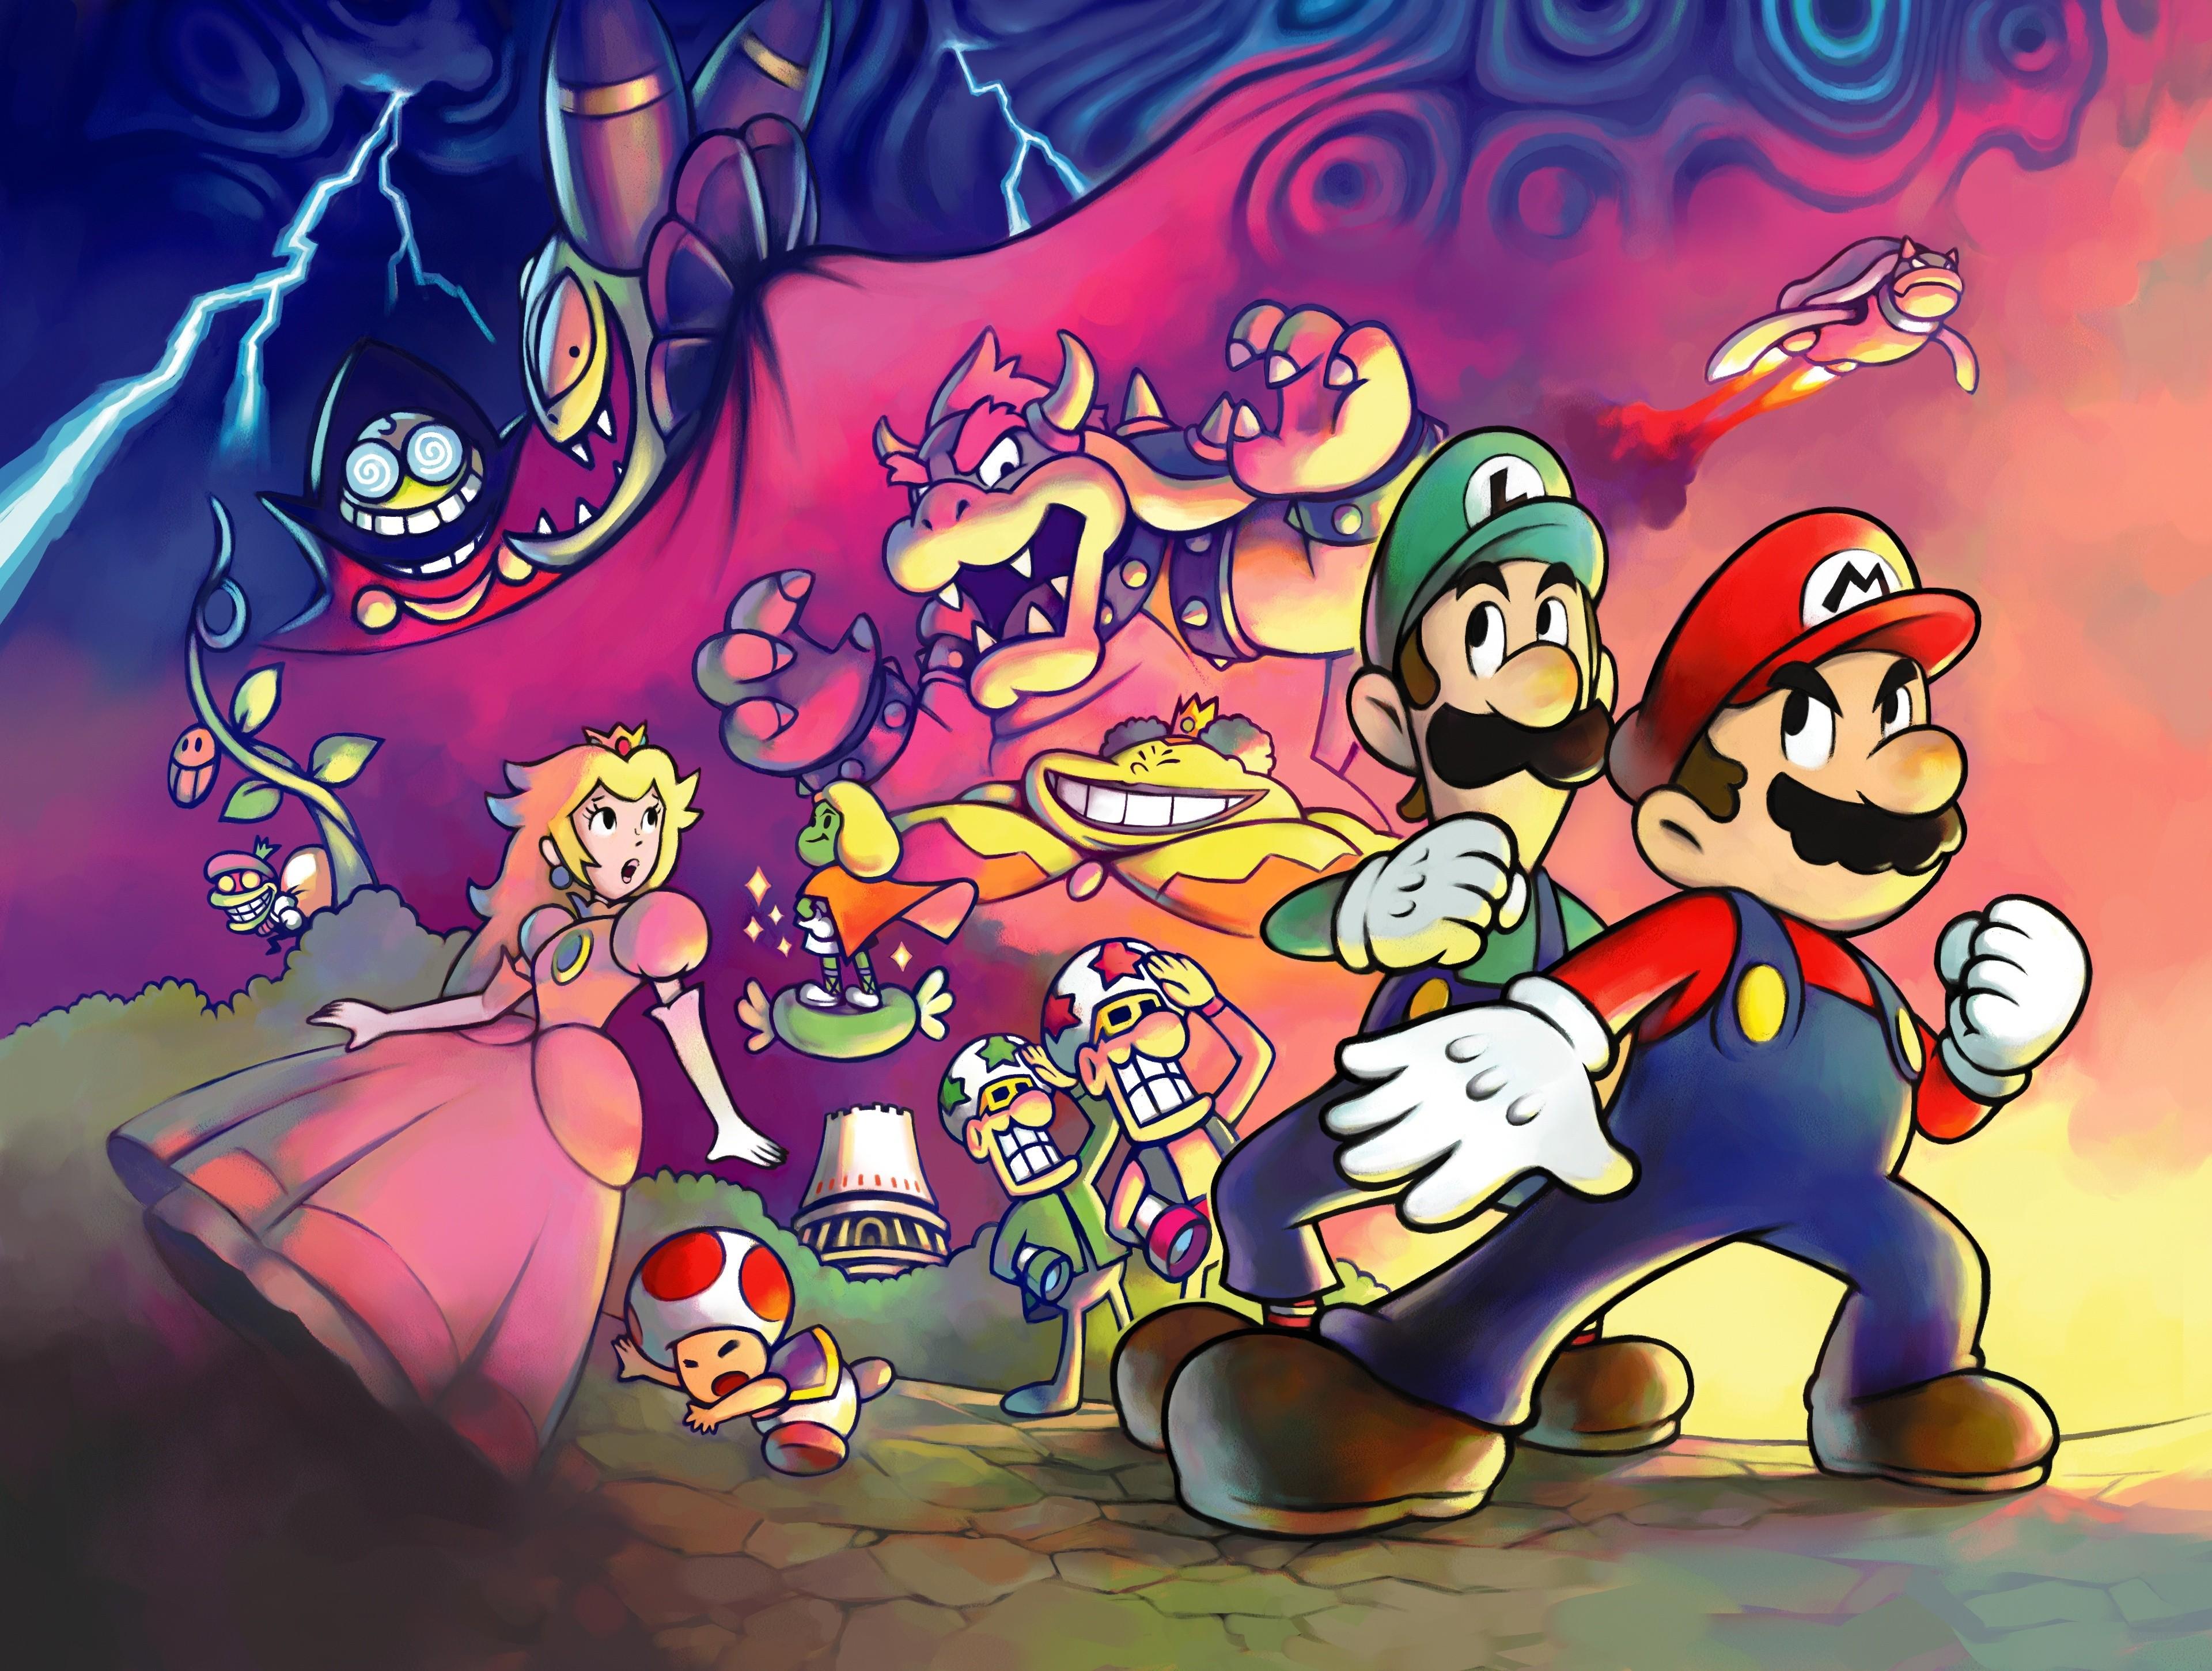 Mario Luigi Superstar Saga Art Id 65874 Art Abyss